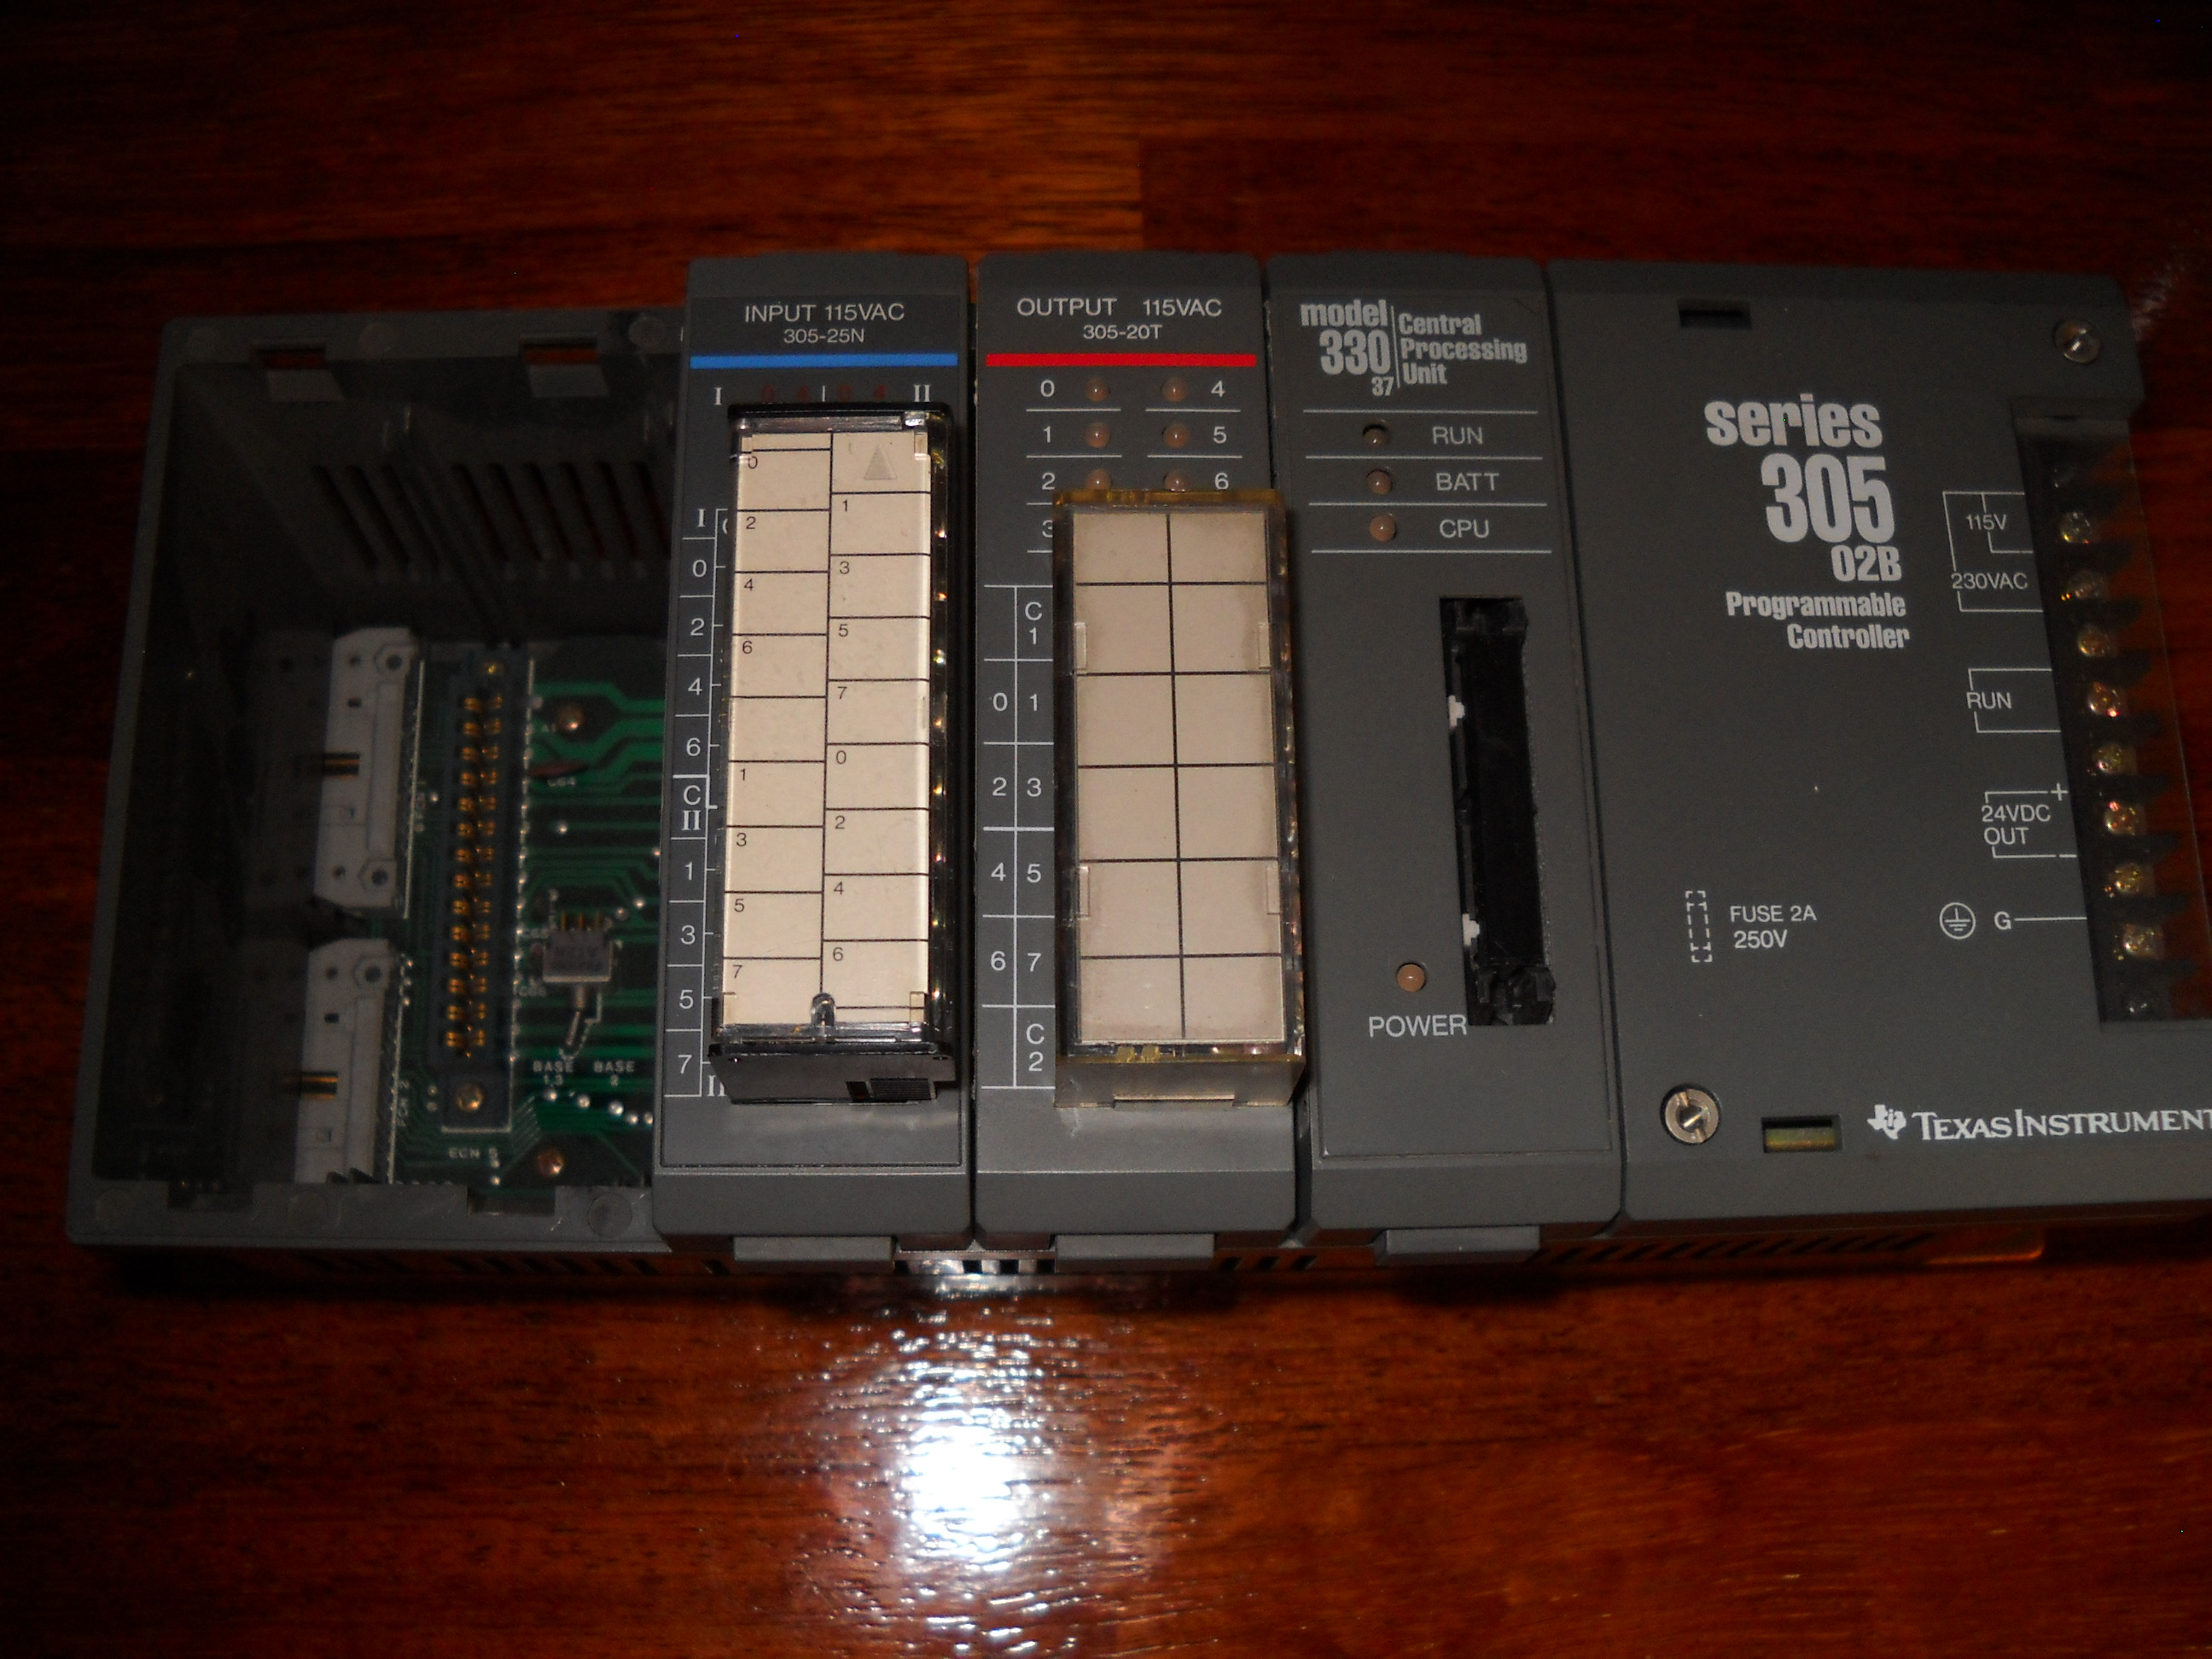 [Sprzedam] Texas Instruments Simens 305-02B + Input + Output + CPU